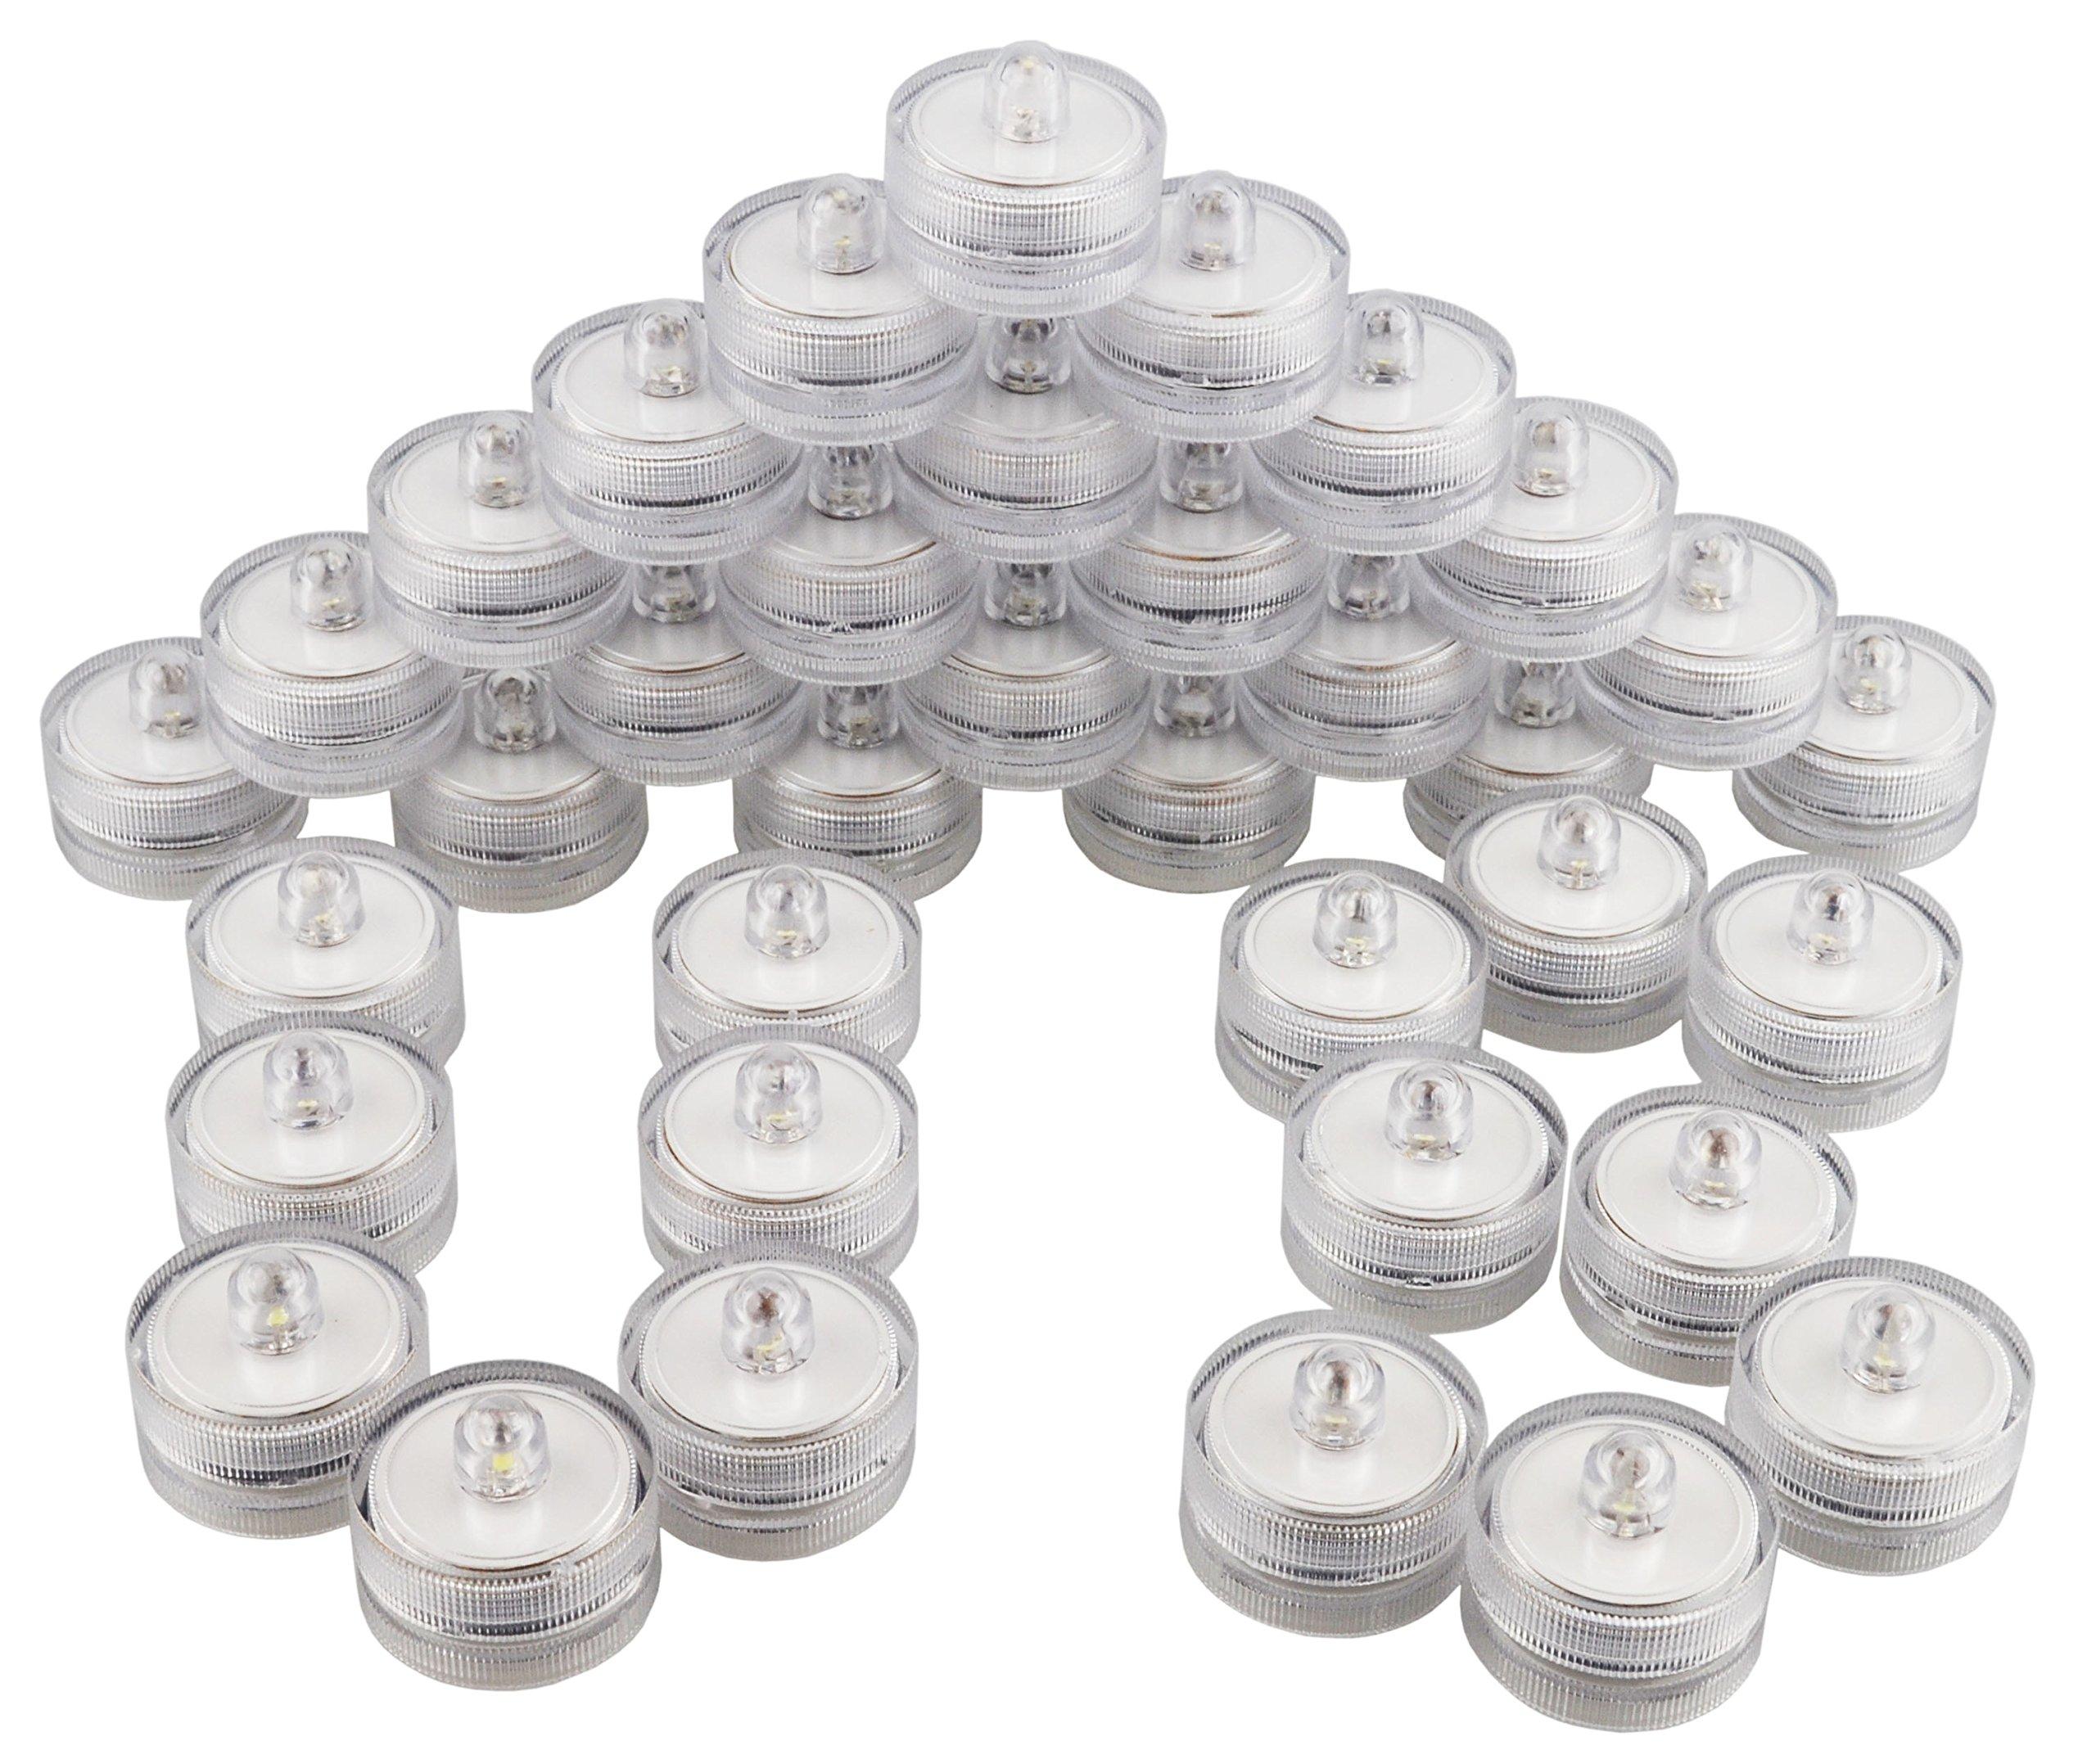 Samyo Set of 36 Waterproof Wedding Submersible Battery LED Tea Lights Underwater Sub Lights- Wedding Centerpieces Party Decorate (White) by Samyo (Image #6)